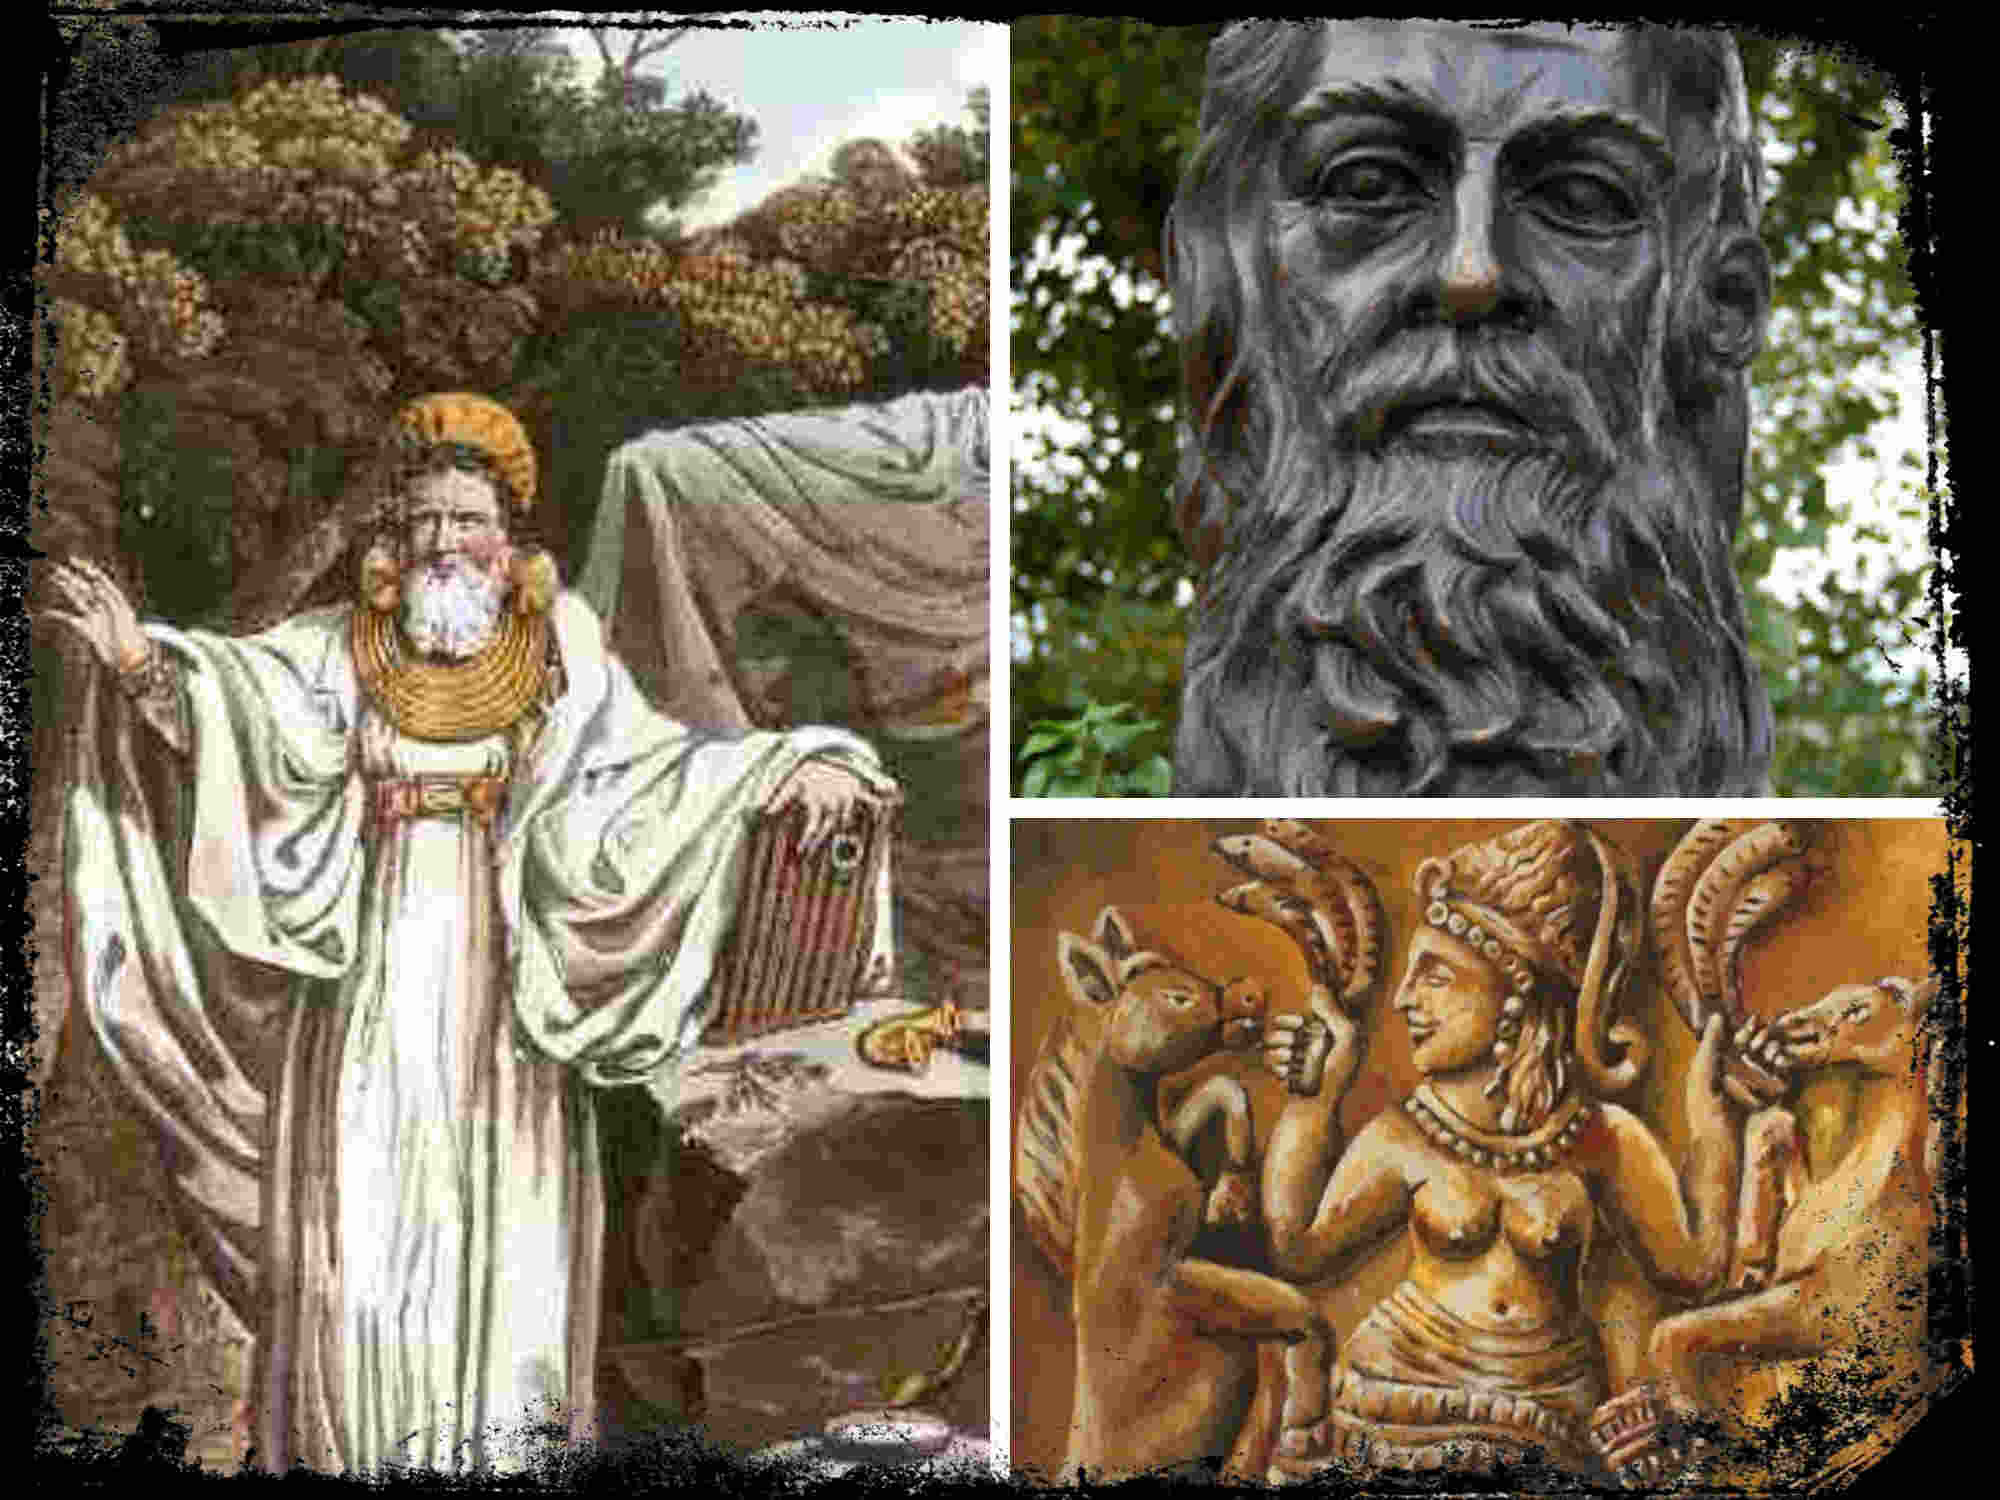 Dioses de Hispania. La religión en la Iberia antigua